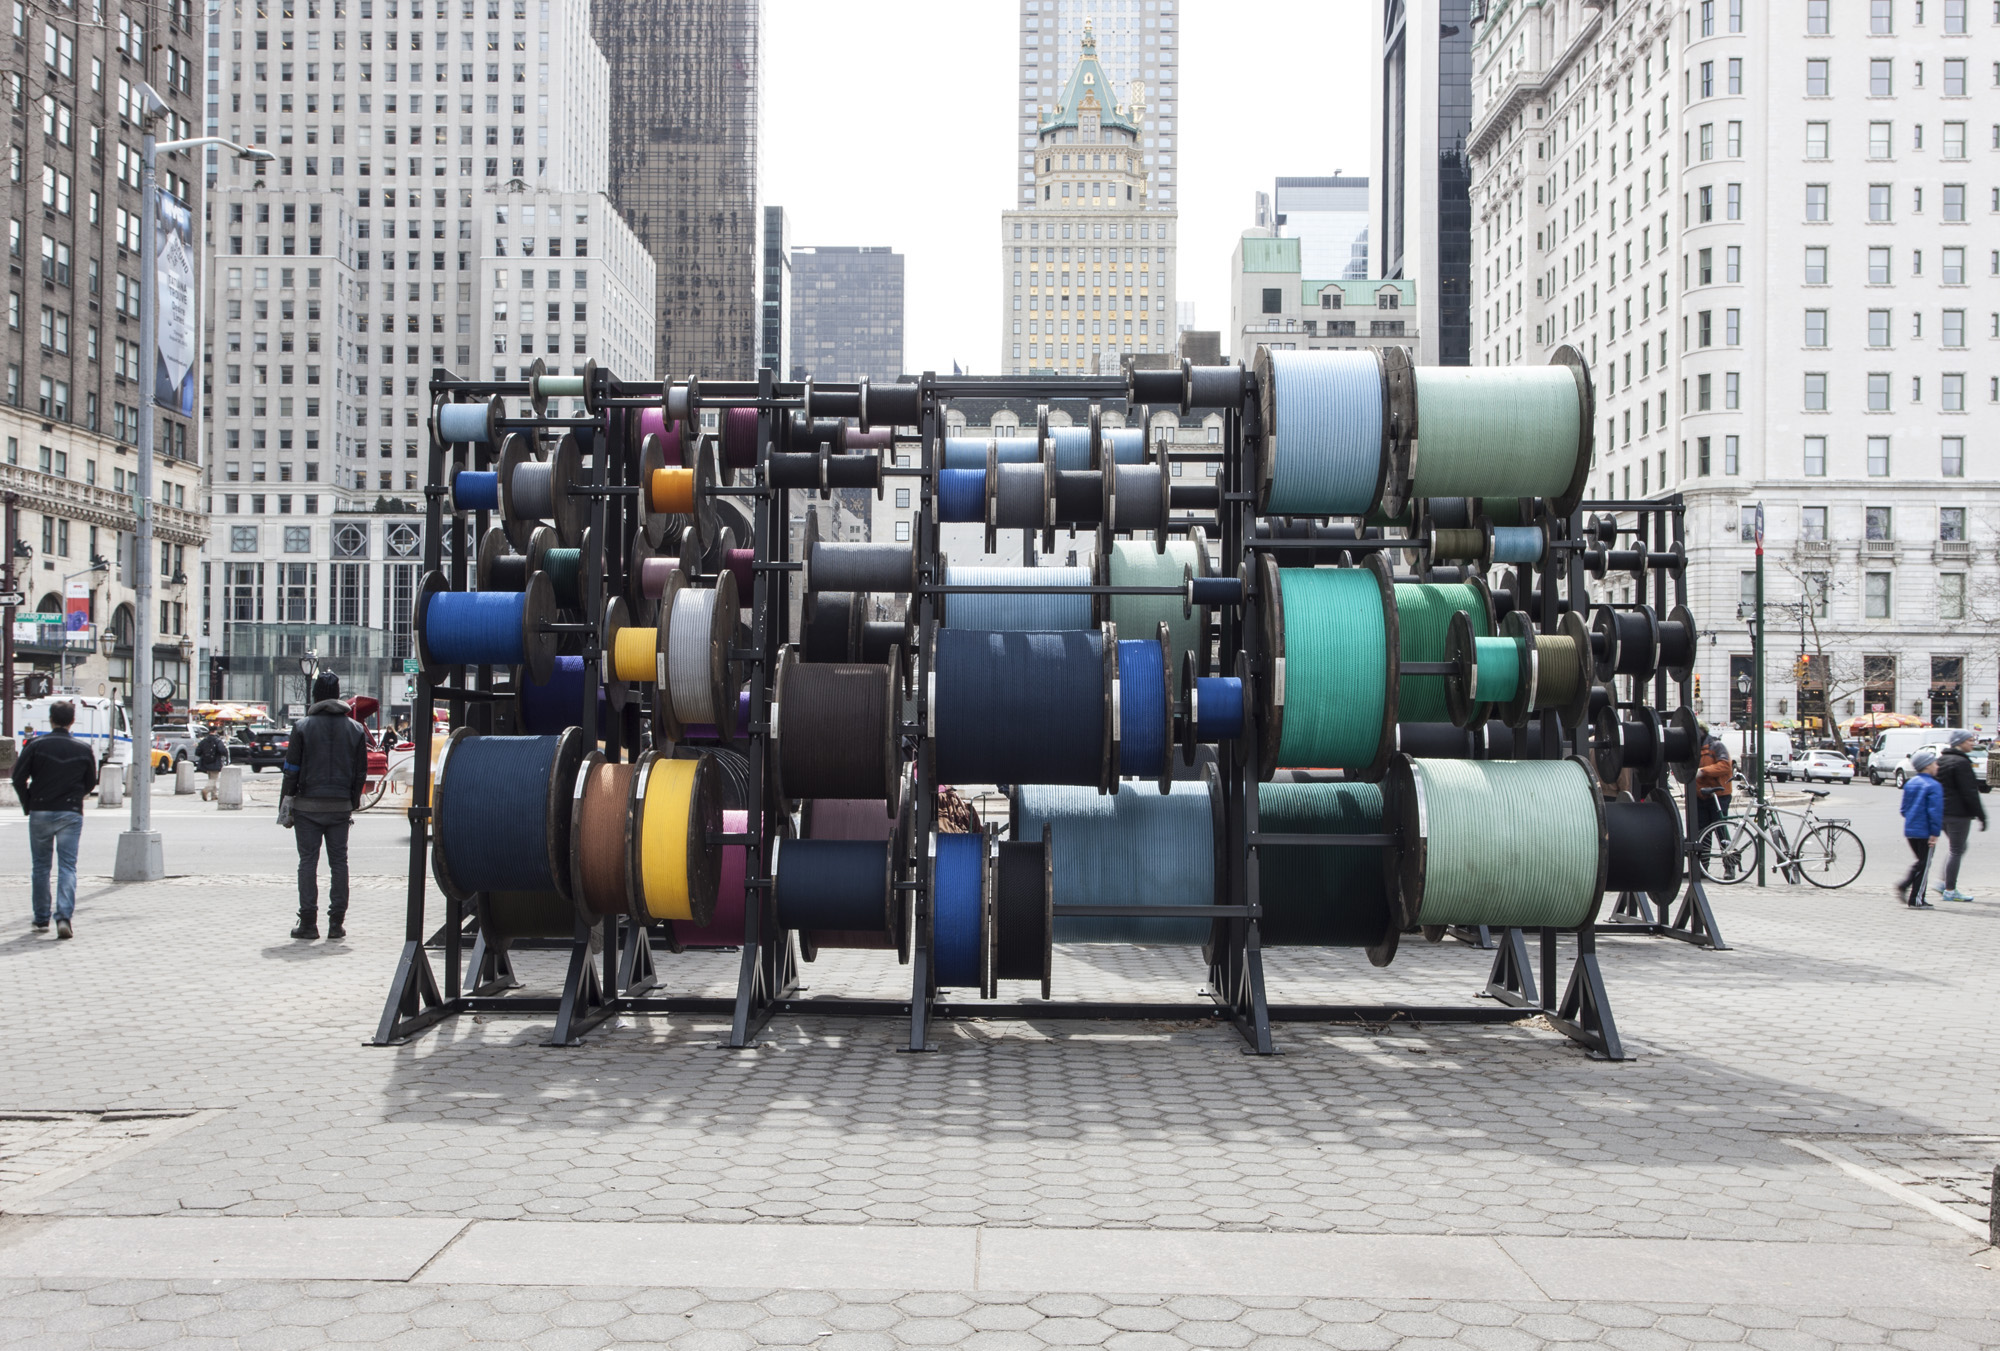 TROUV 2015.0004 Central Park 2015 Install 8